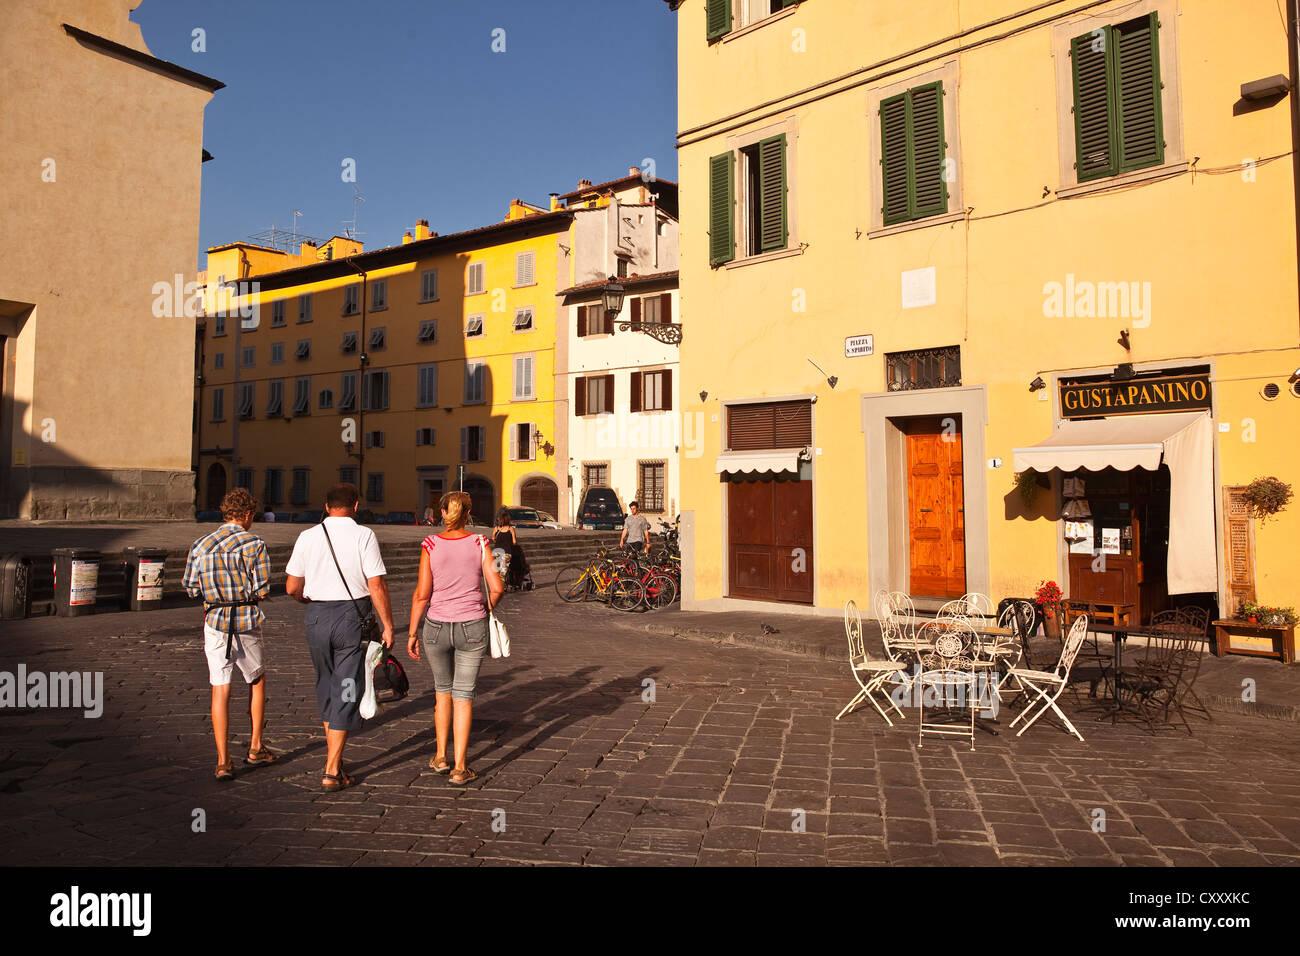 Tourists walking in Piazza Santo Spirito, Florence. Stock Photo